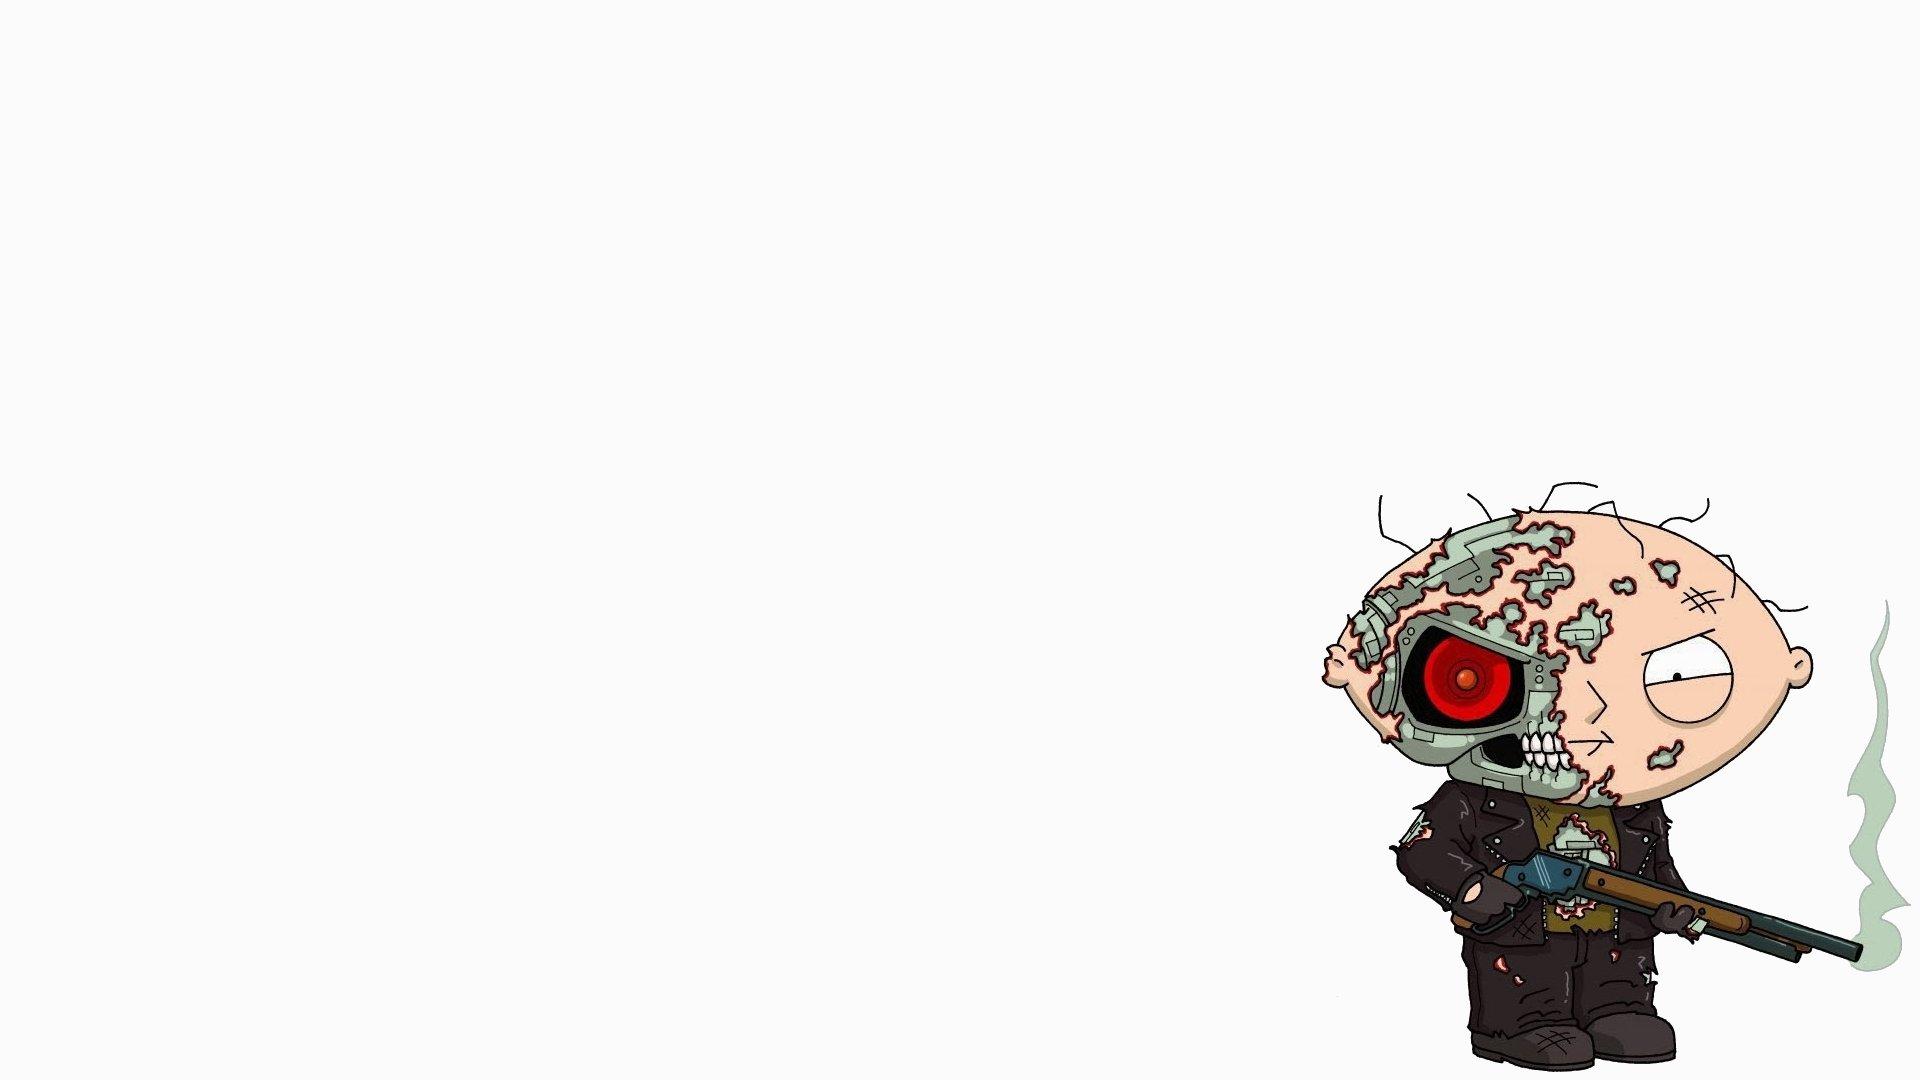 Free Download Family Guy Wallpaper ID155806 1080p For Desktop